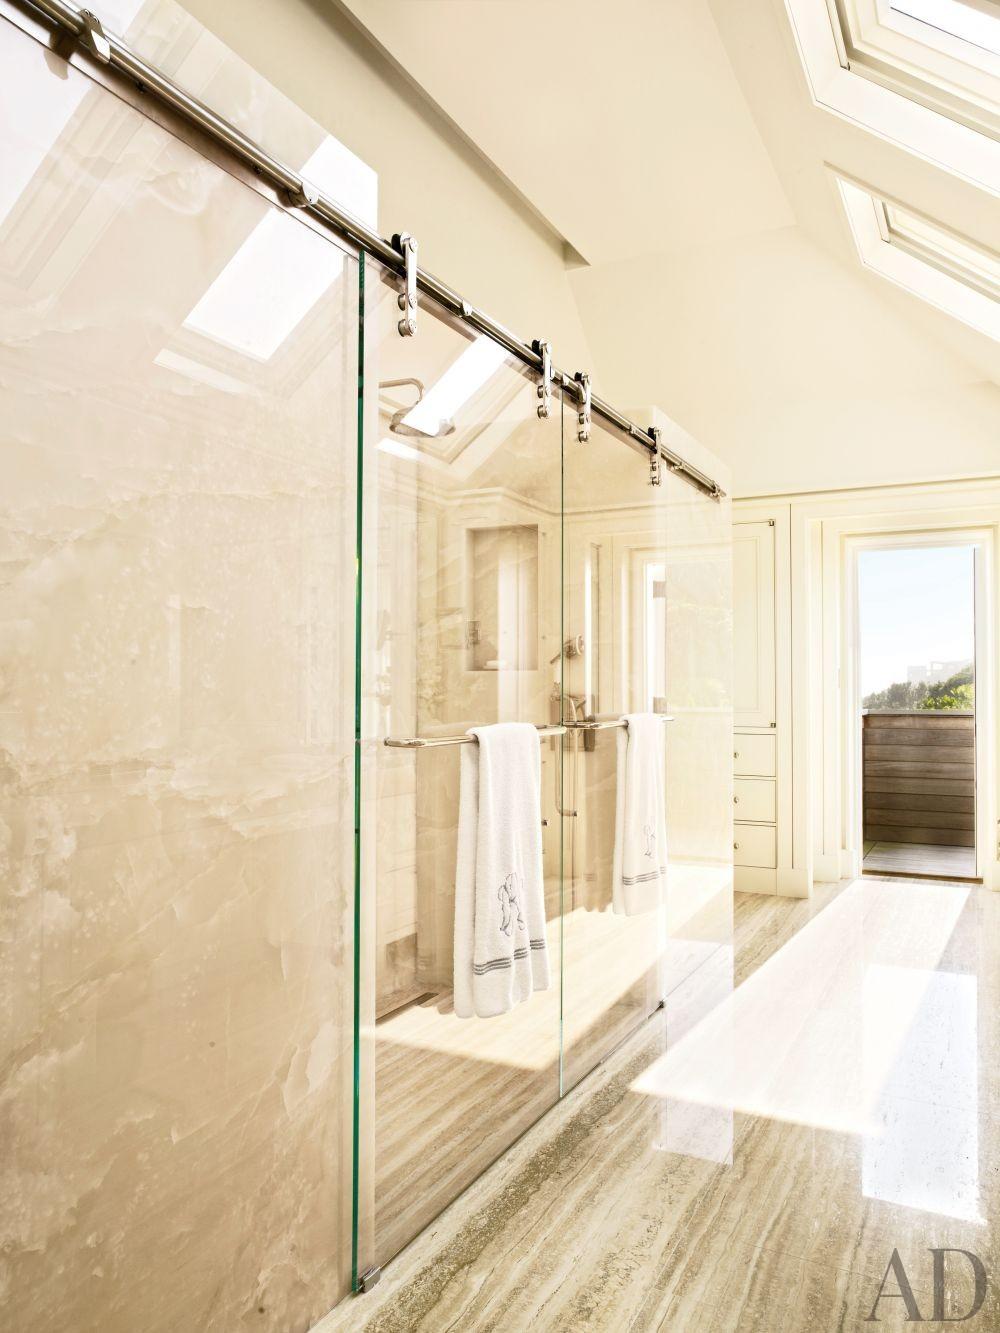 Beach Bathroom by Thierry Despont Ltd. and Thierry Despont Ltd. in East Hampton, New York